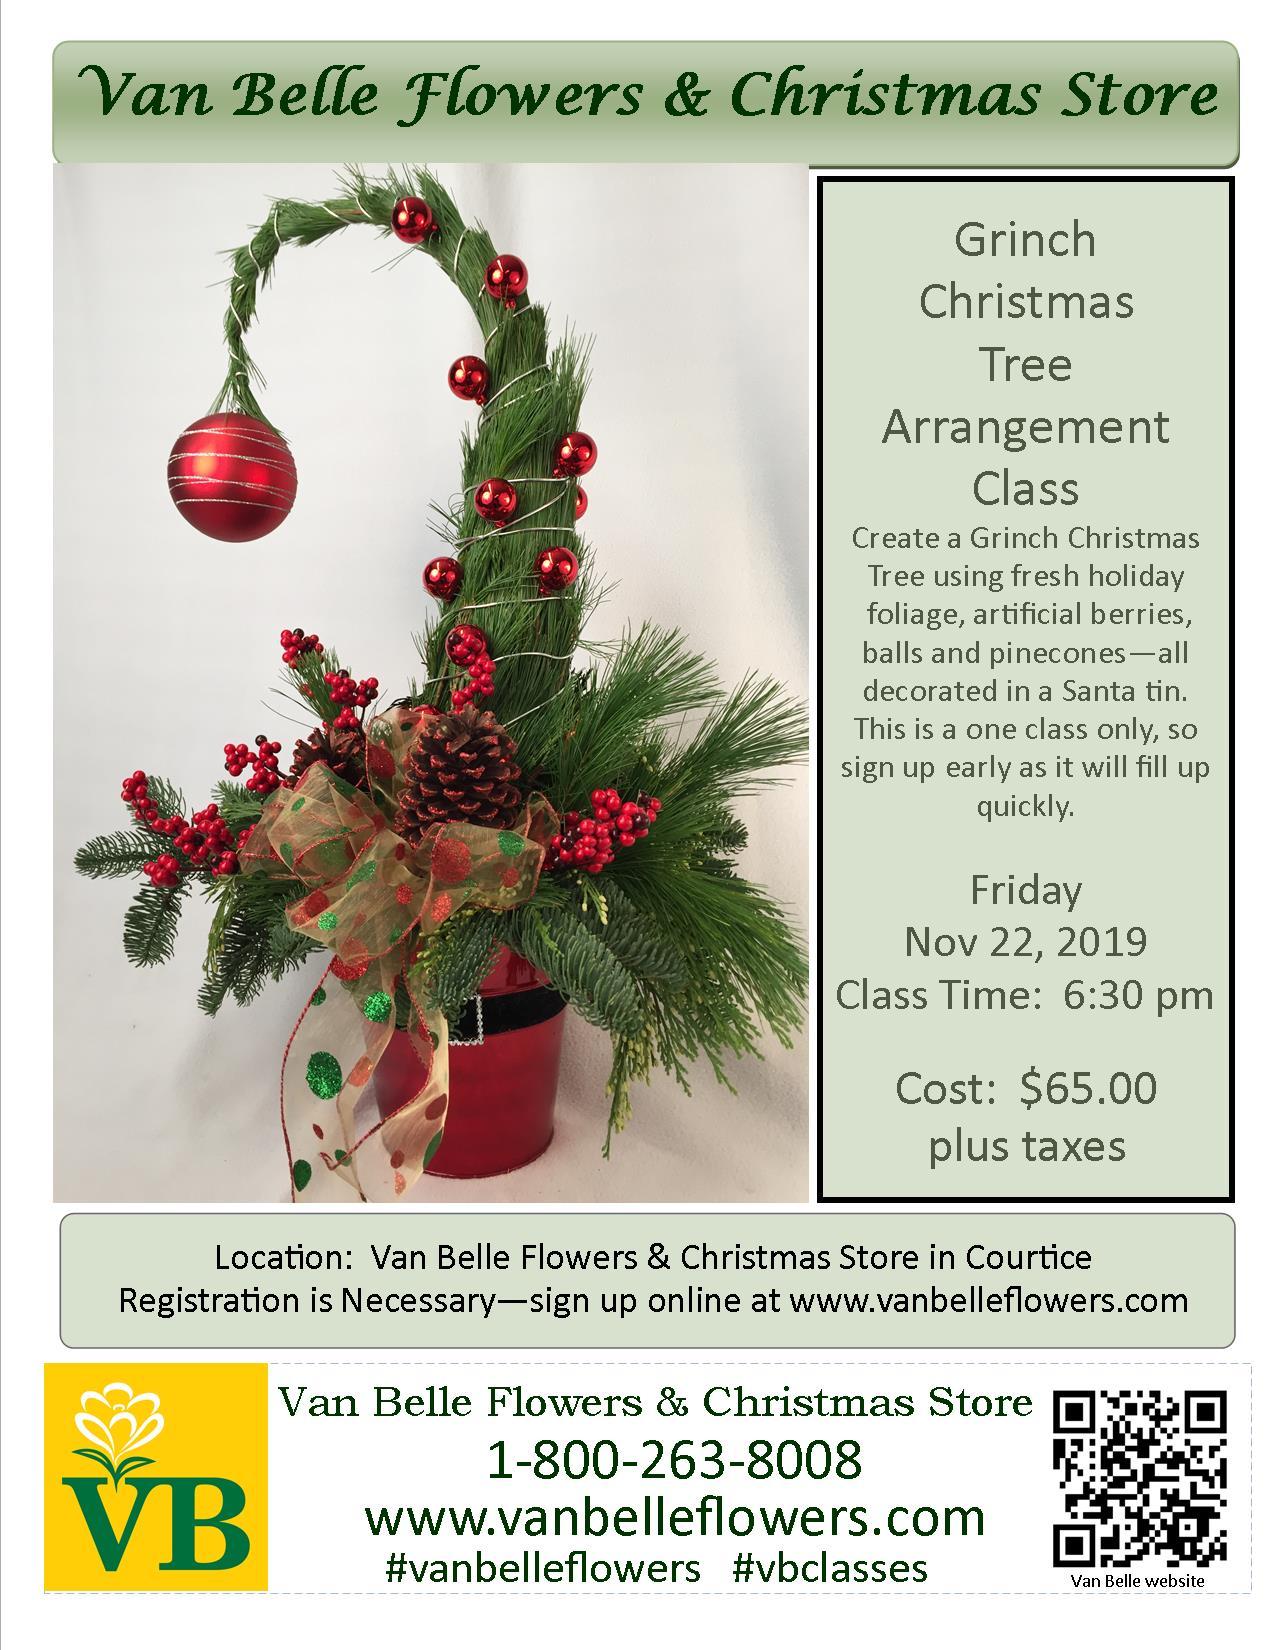 The Grinch Christmas Tree.Grinch Christmas Tree Class Thursday November 21 2019 6 30pm